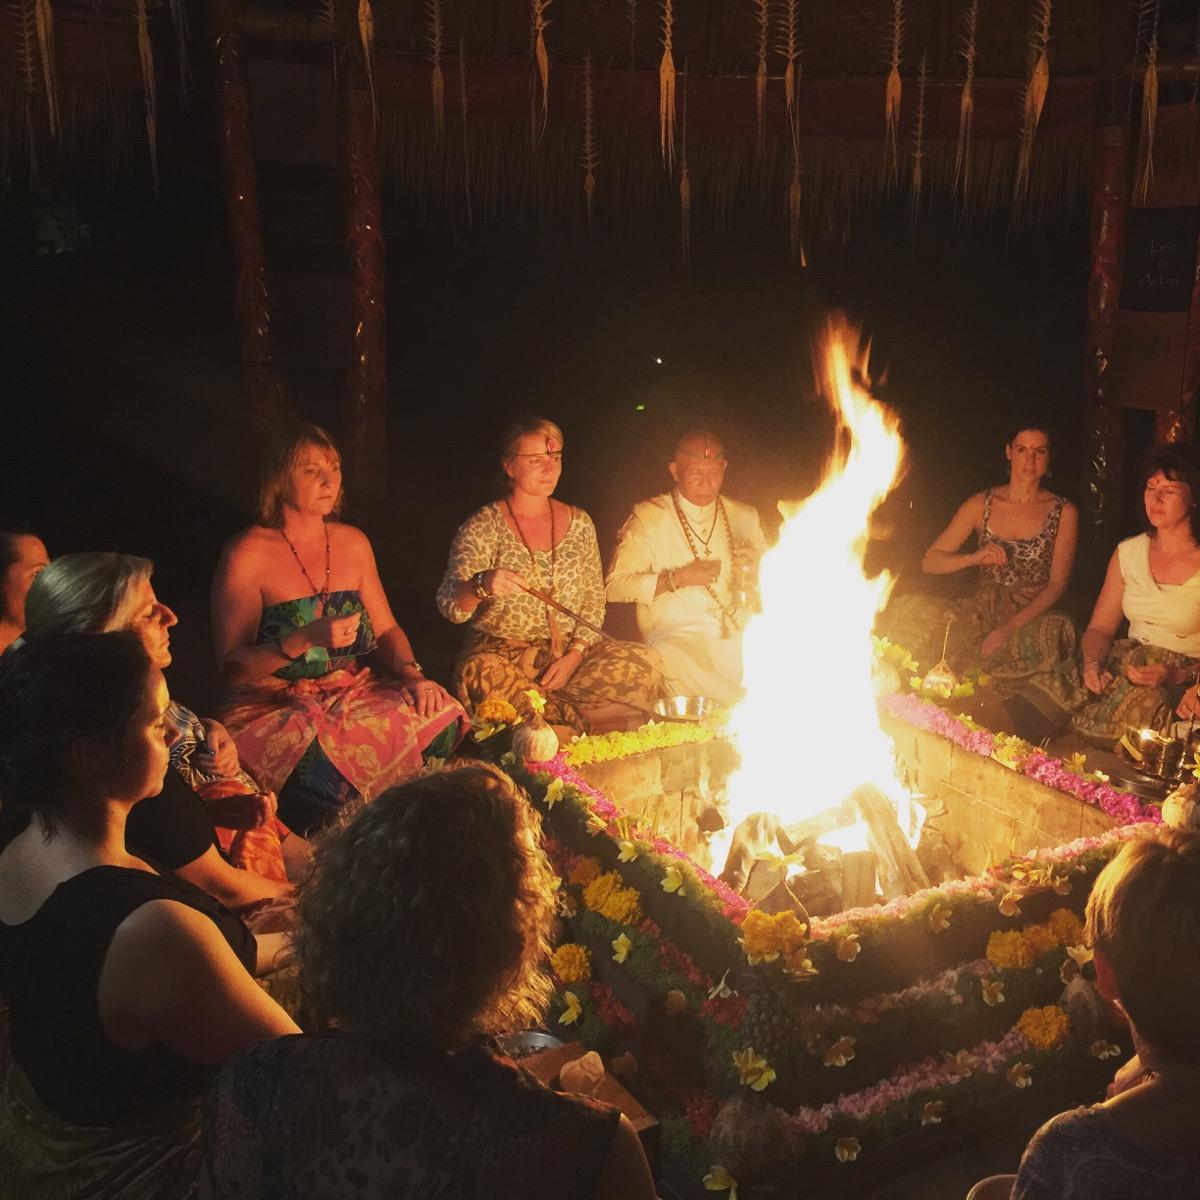 Serenity and Spirituality